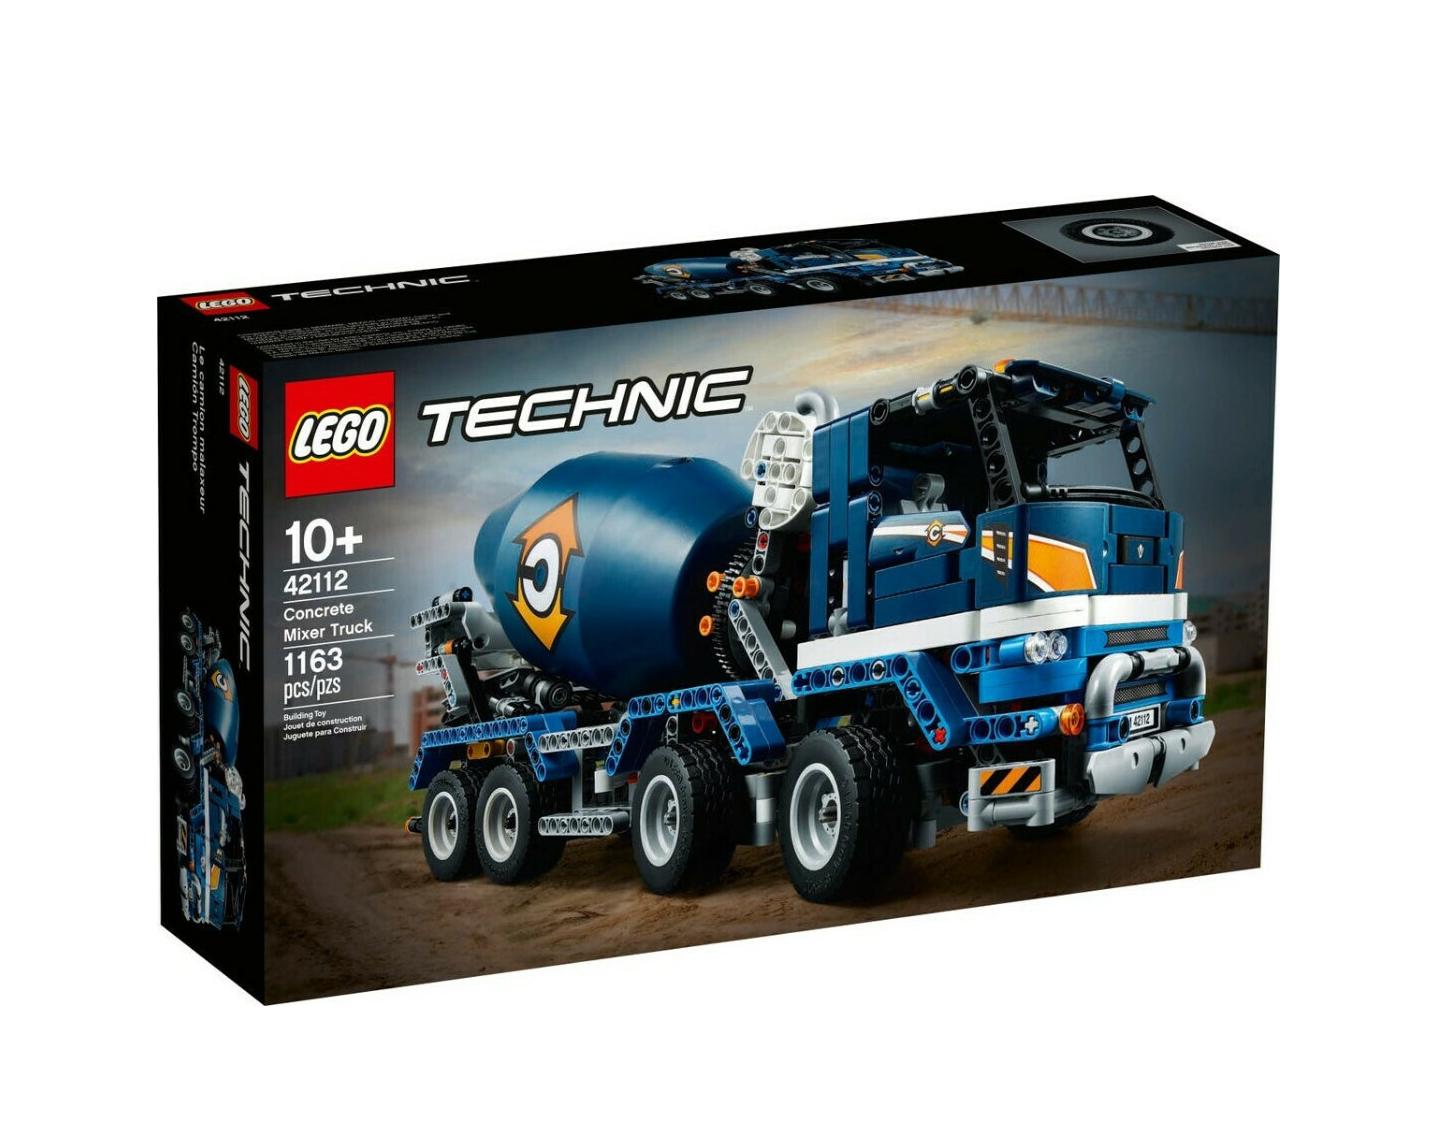 Lego Technic: Concrete Mixer Truck 42112